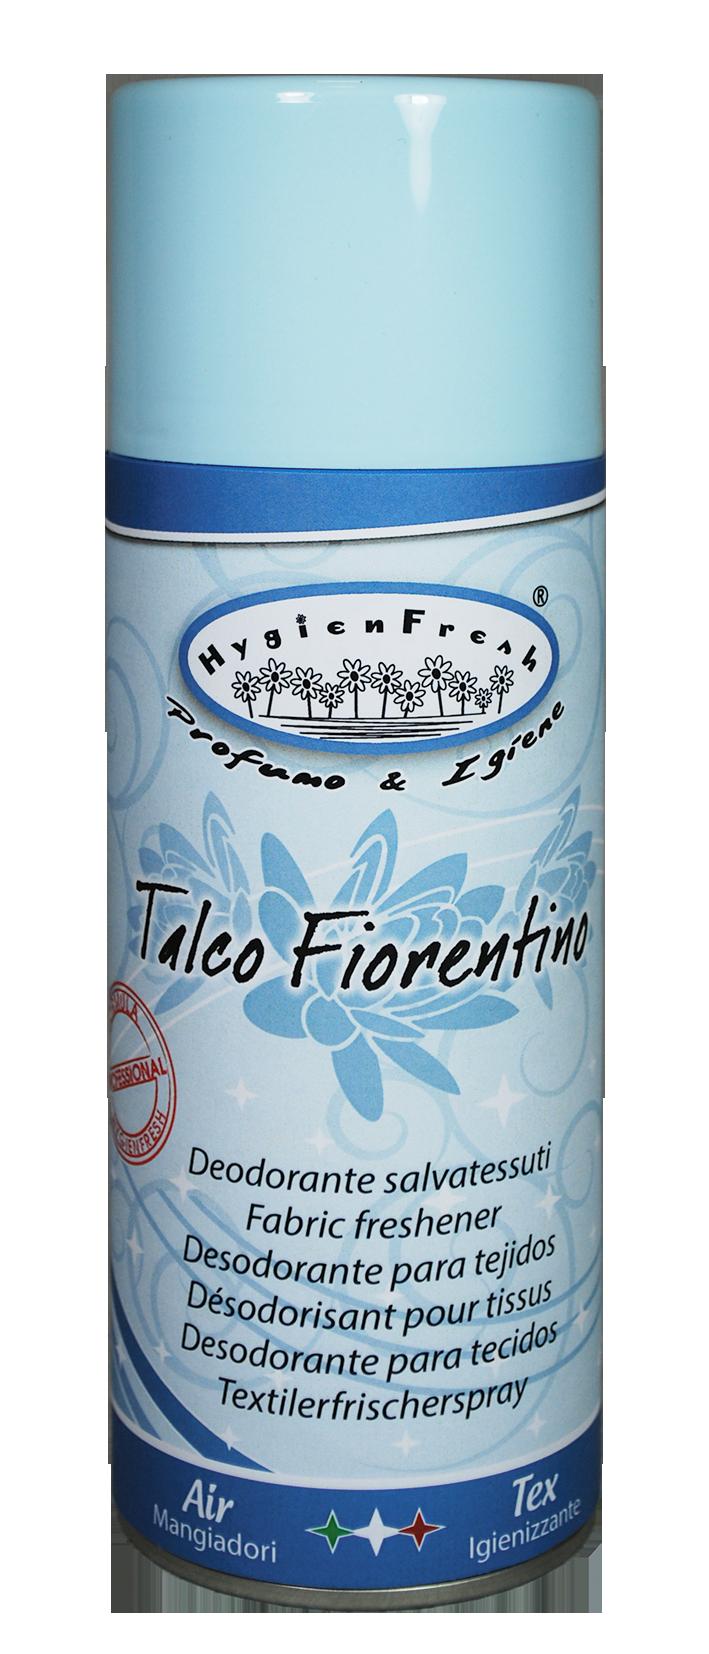 spray deodorant hf talco